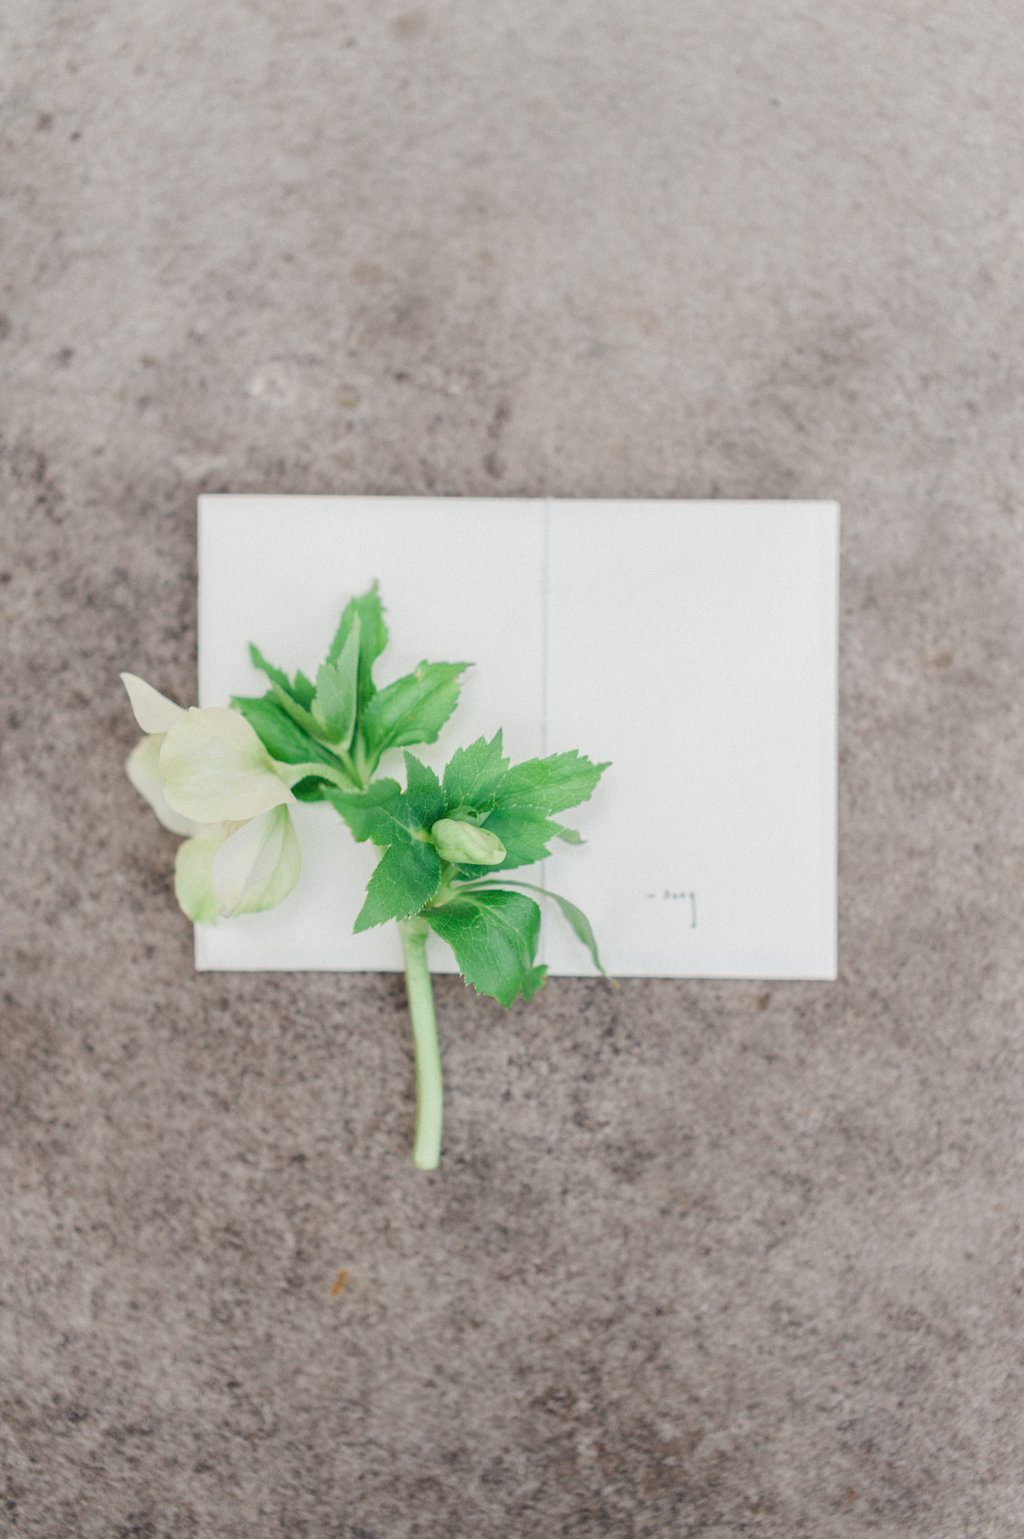 swan-house-atlanta-wedding-photographer-hannah-forsberg-1.jpg